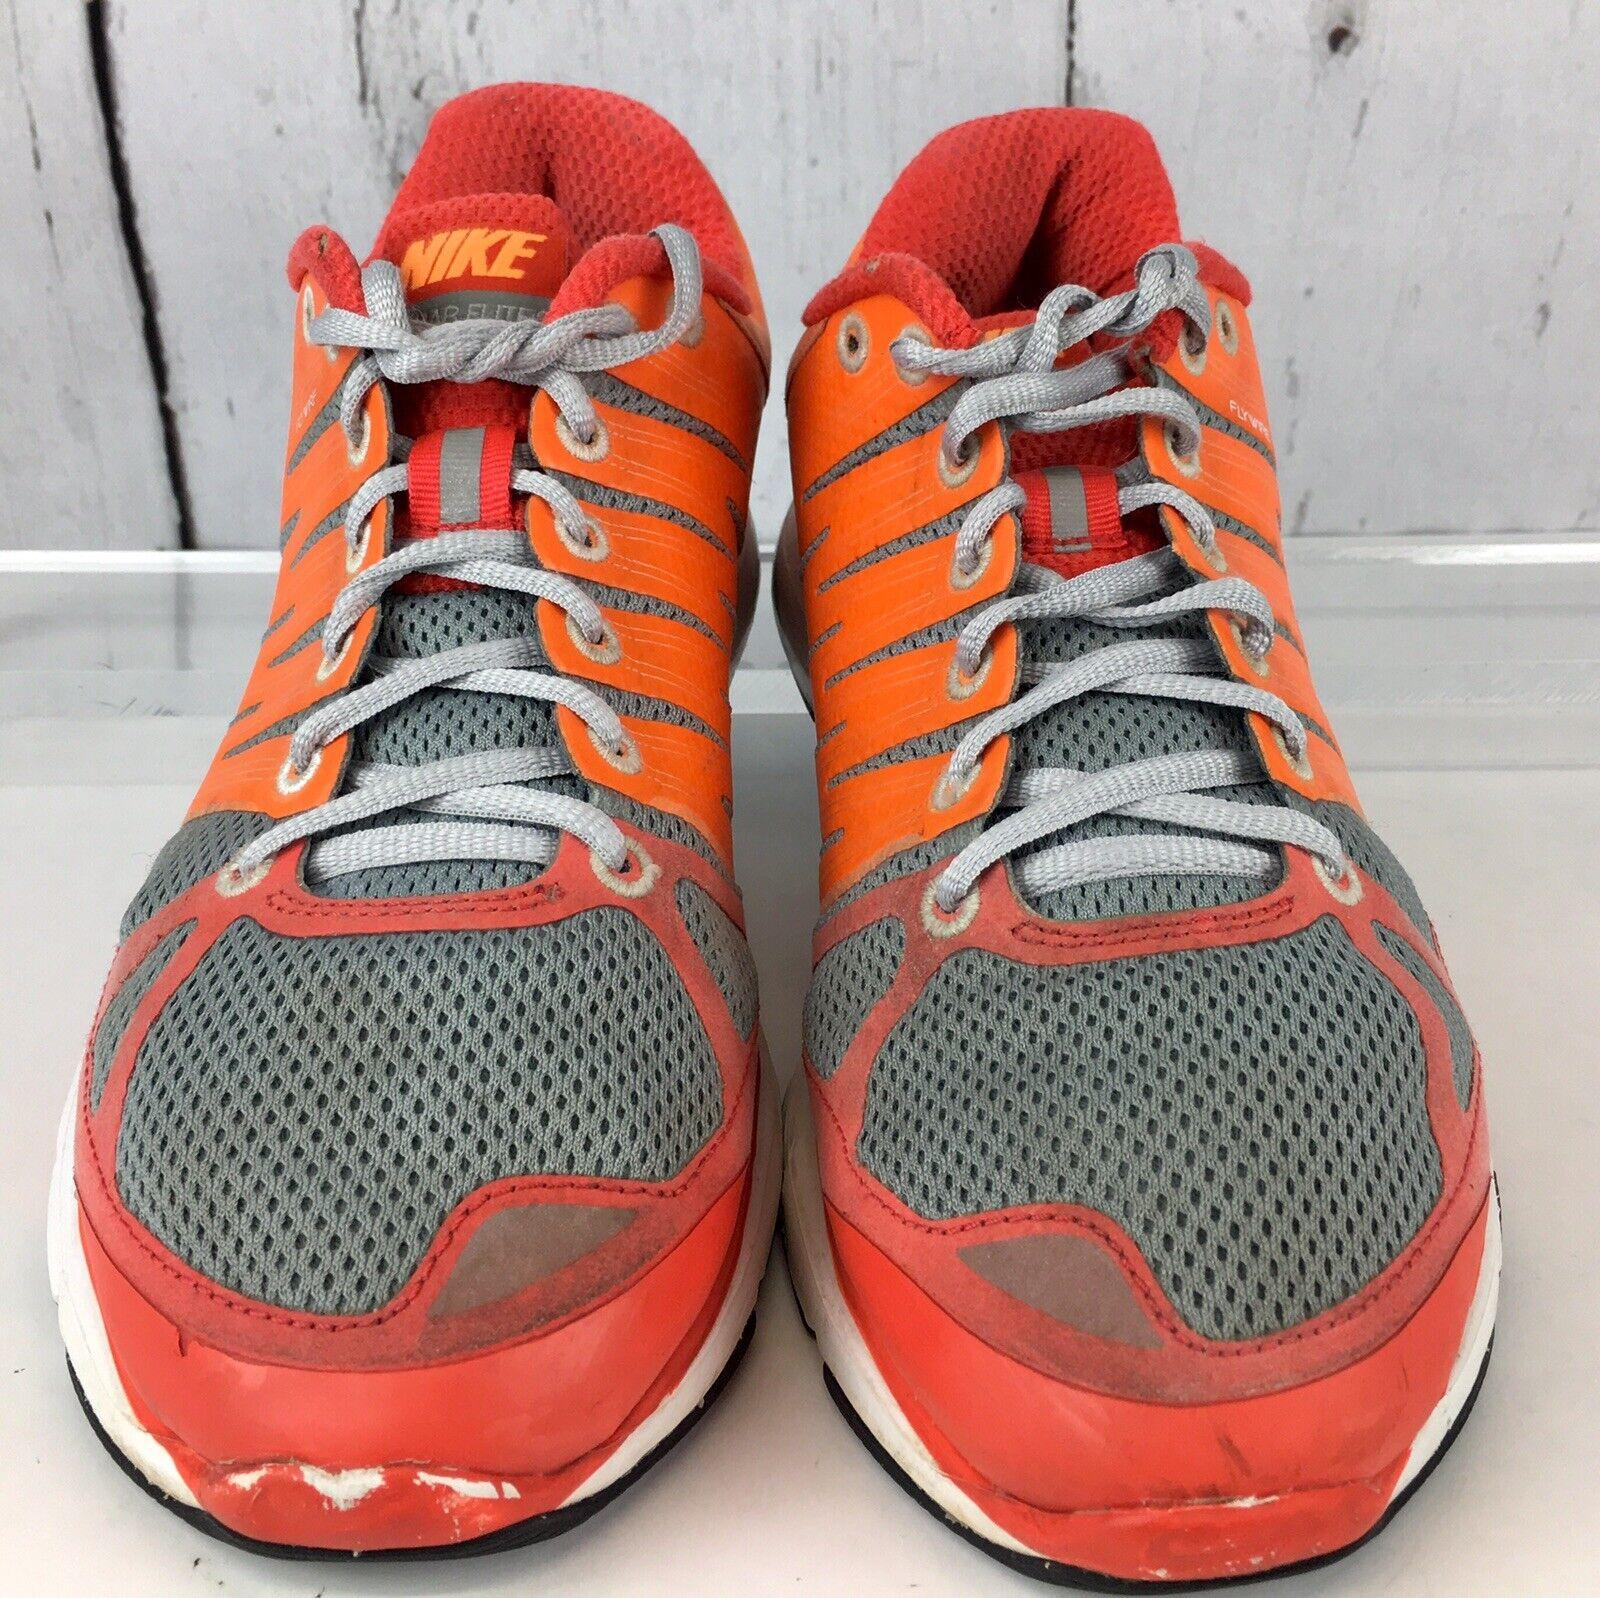 factory price b04d9 029c0 ... nike lunarlon lunarlon lunarlon lunar elite 2 flywire scarpe da corsa,  ...